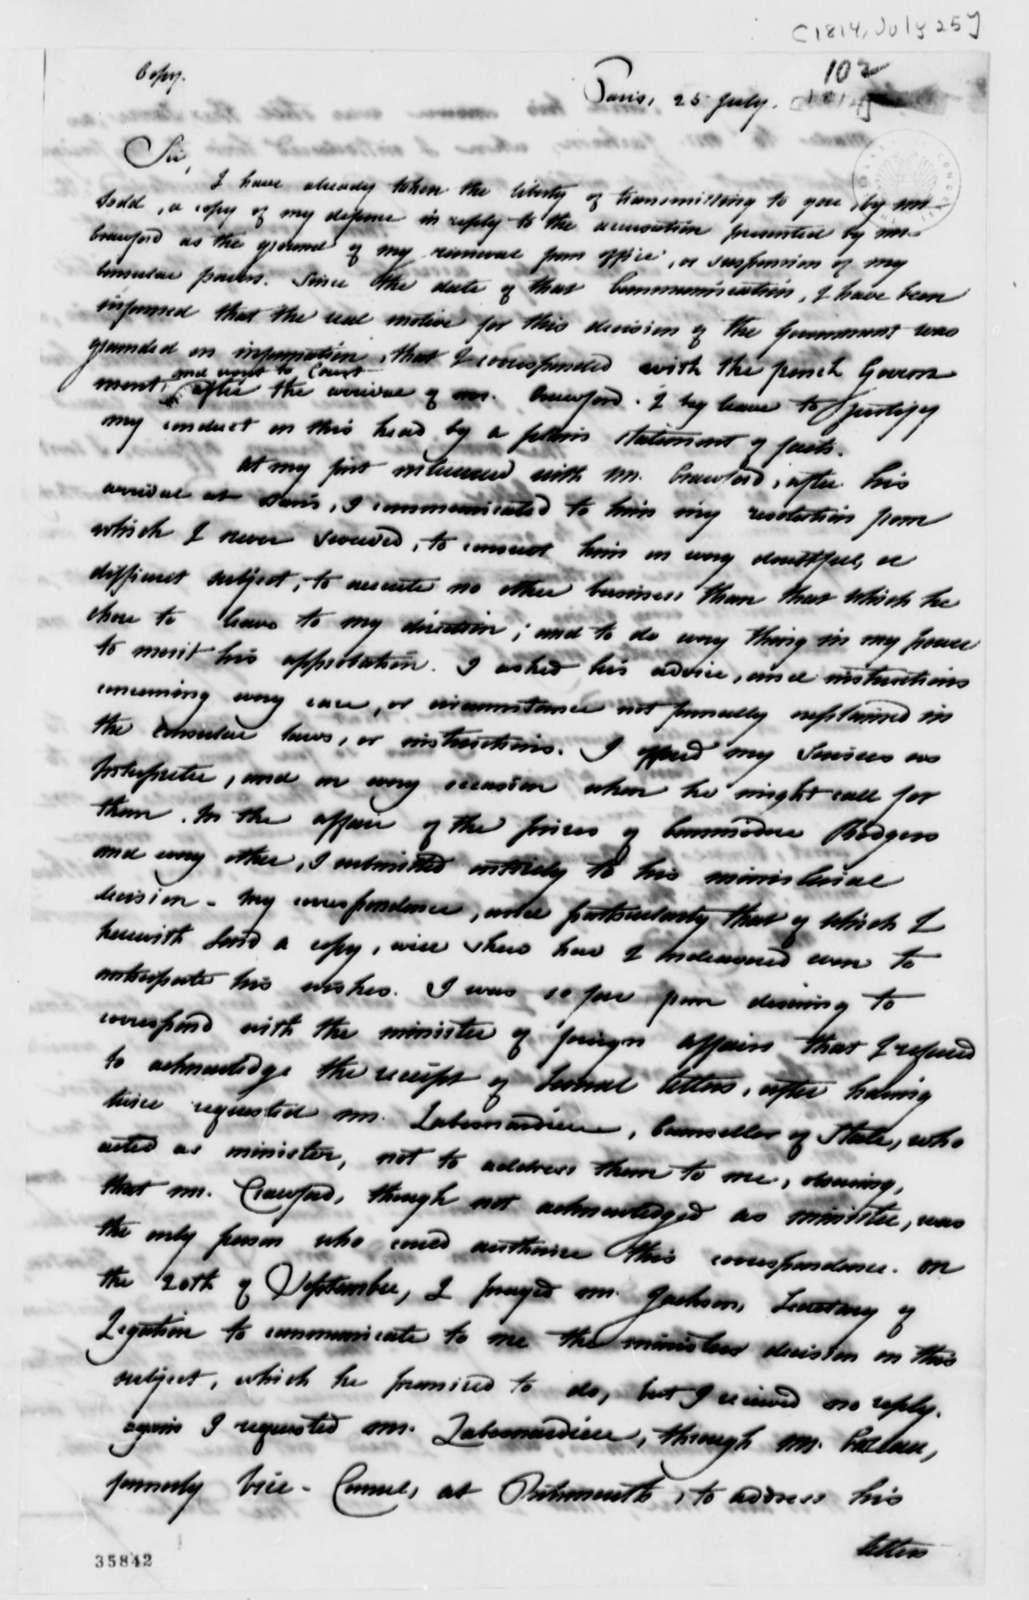 David B. Warden to Thomas Jefferson, July 25, 1814